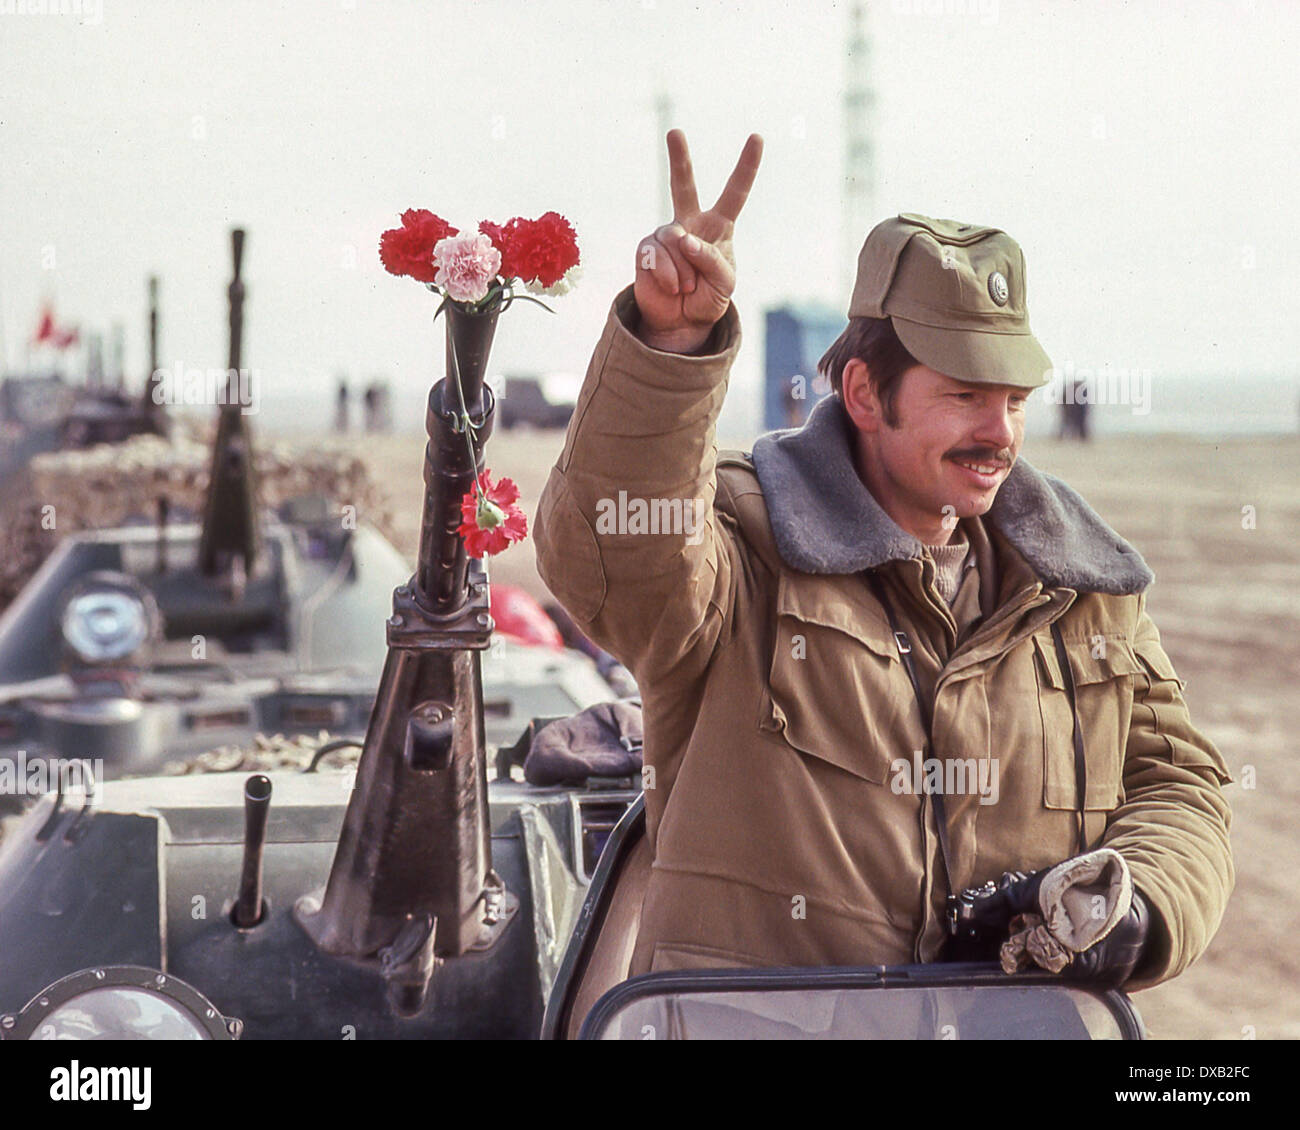 Soviet Afghanistan war - Page 6 Feb-16-1989-termez-uzbekistan-ru-standing-atop-a-soviet-armored-personnel-DXB2FC